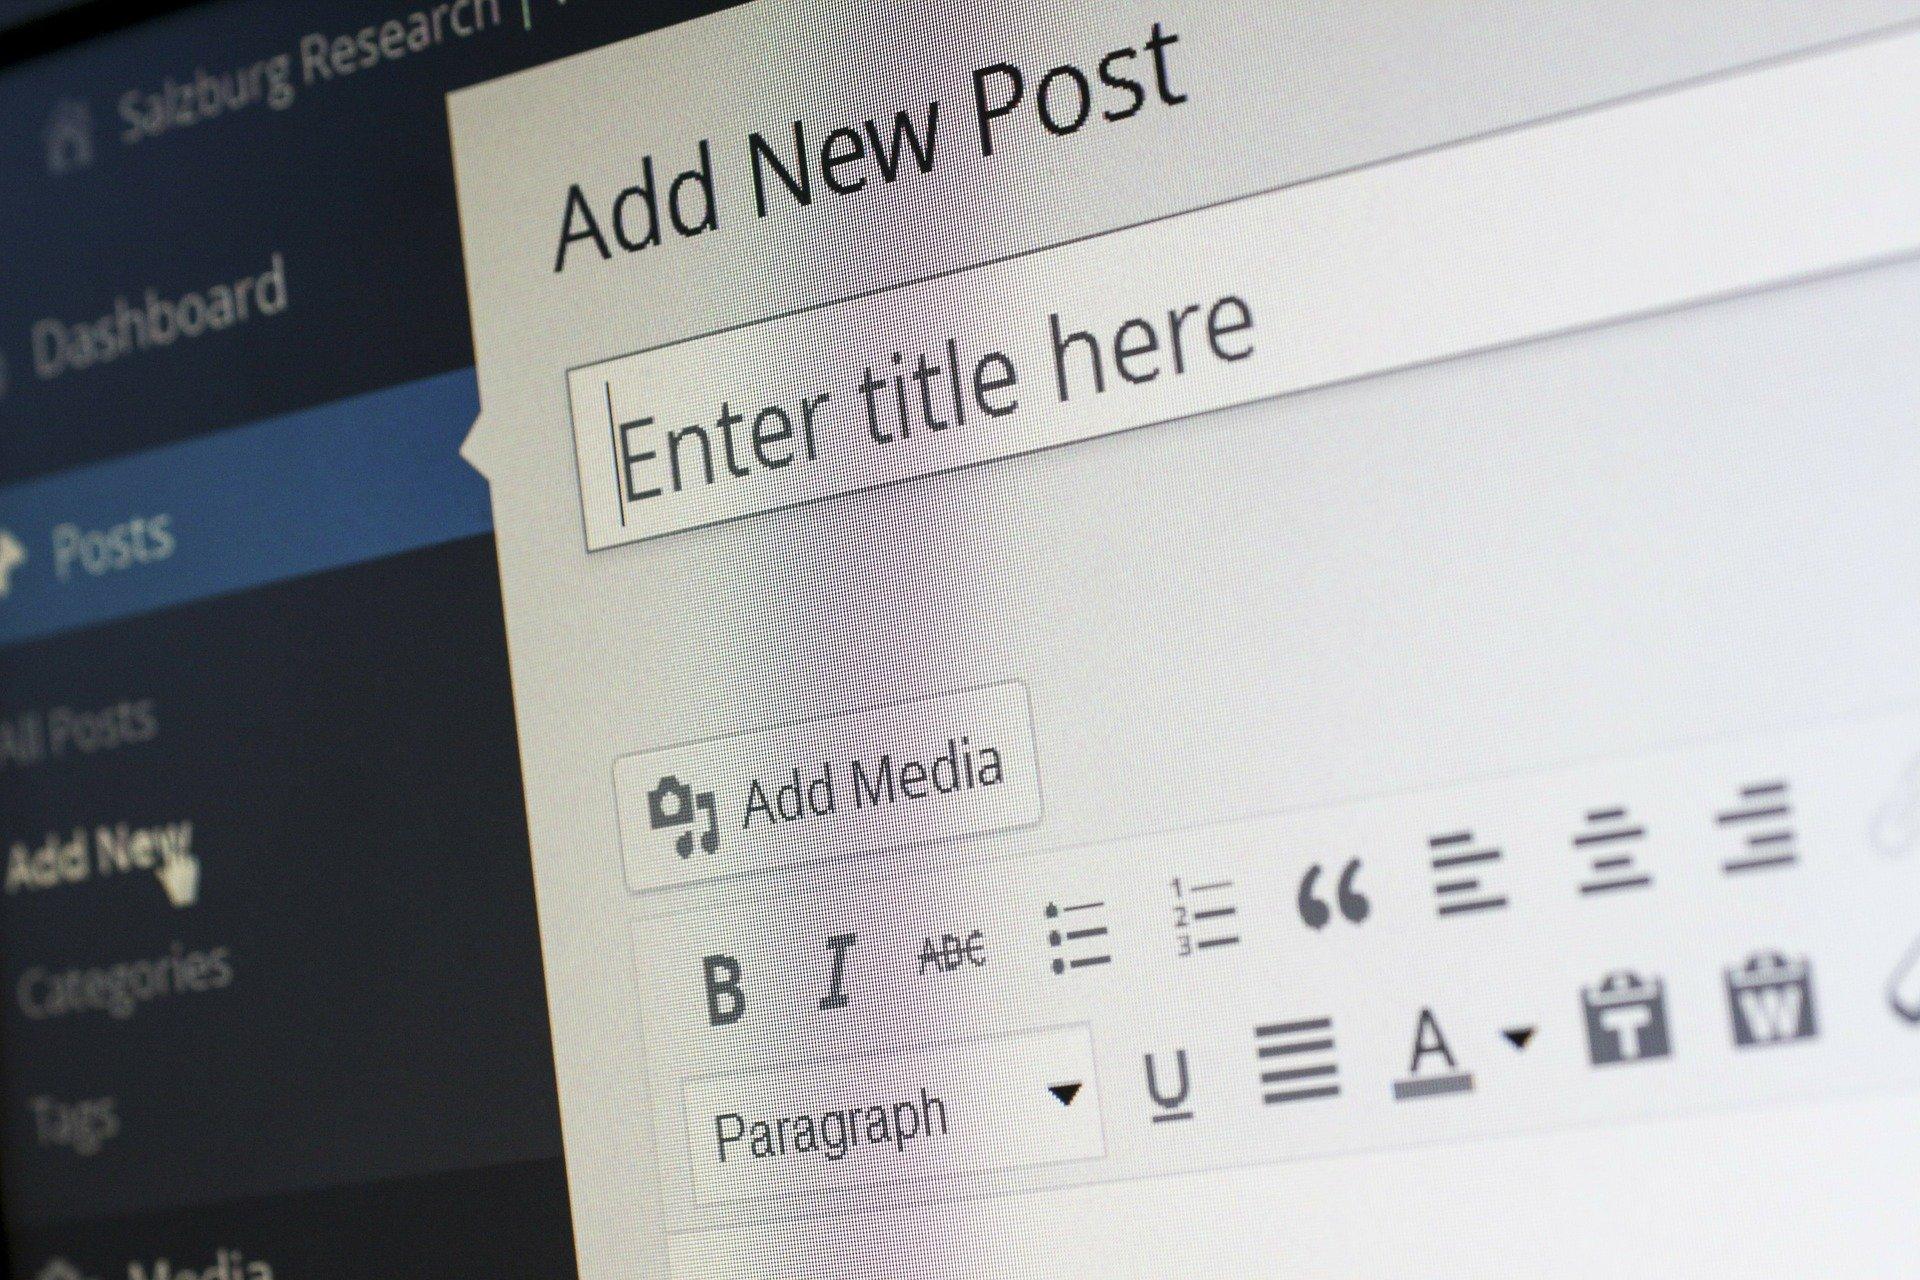 photo of a wordpress website user adding a new blog post